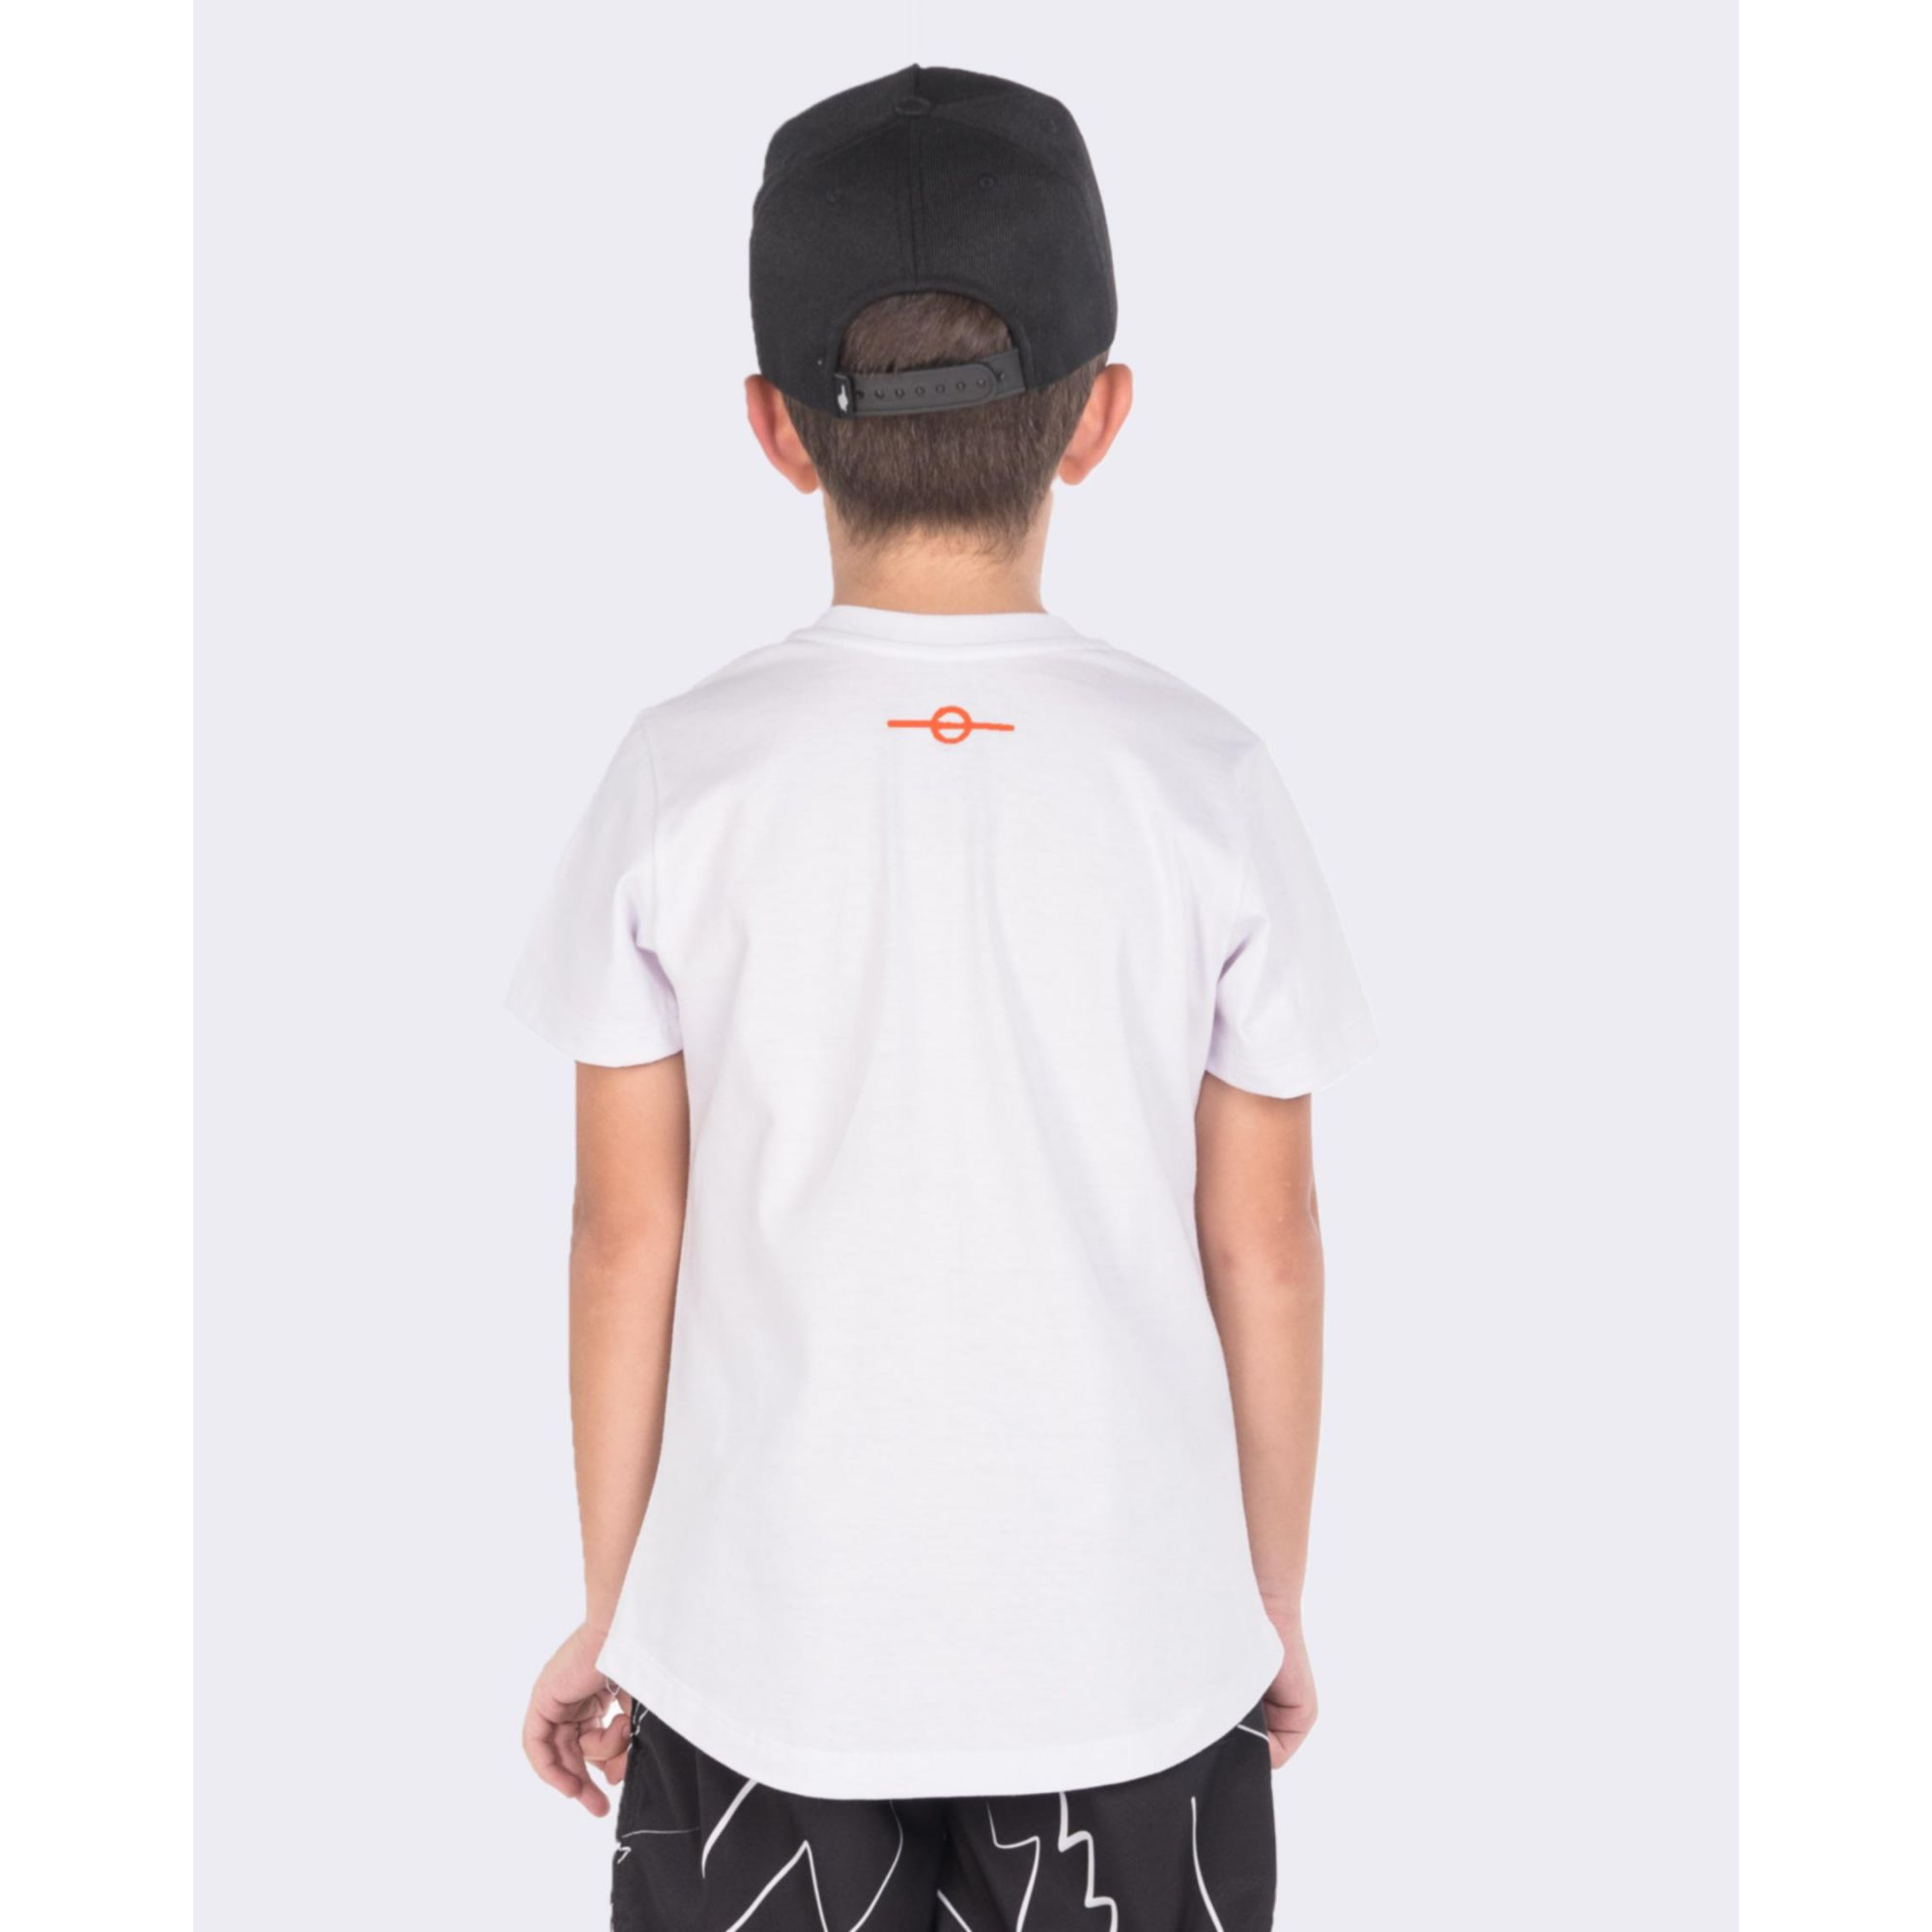 Camiseta Buh Kids Inverse White & Neon